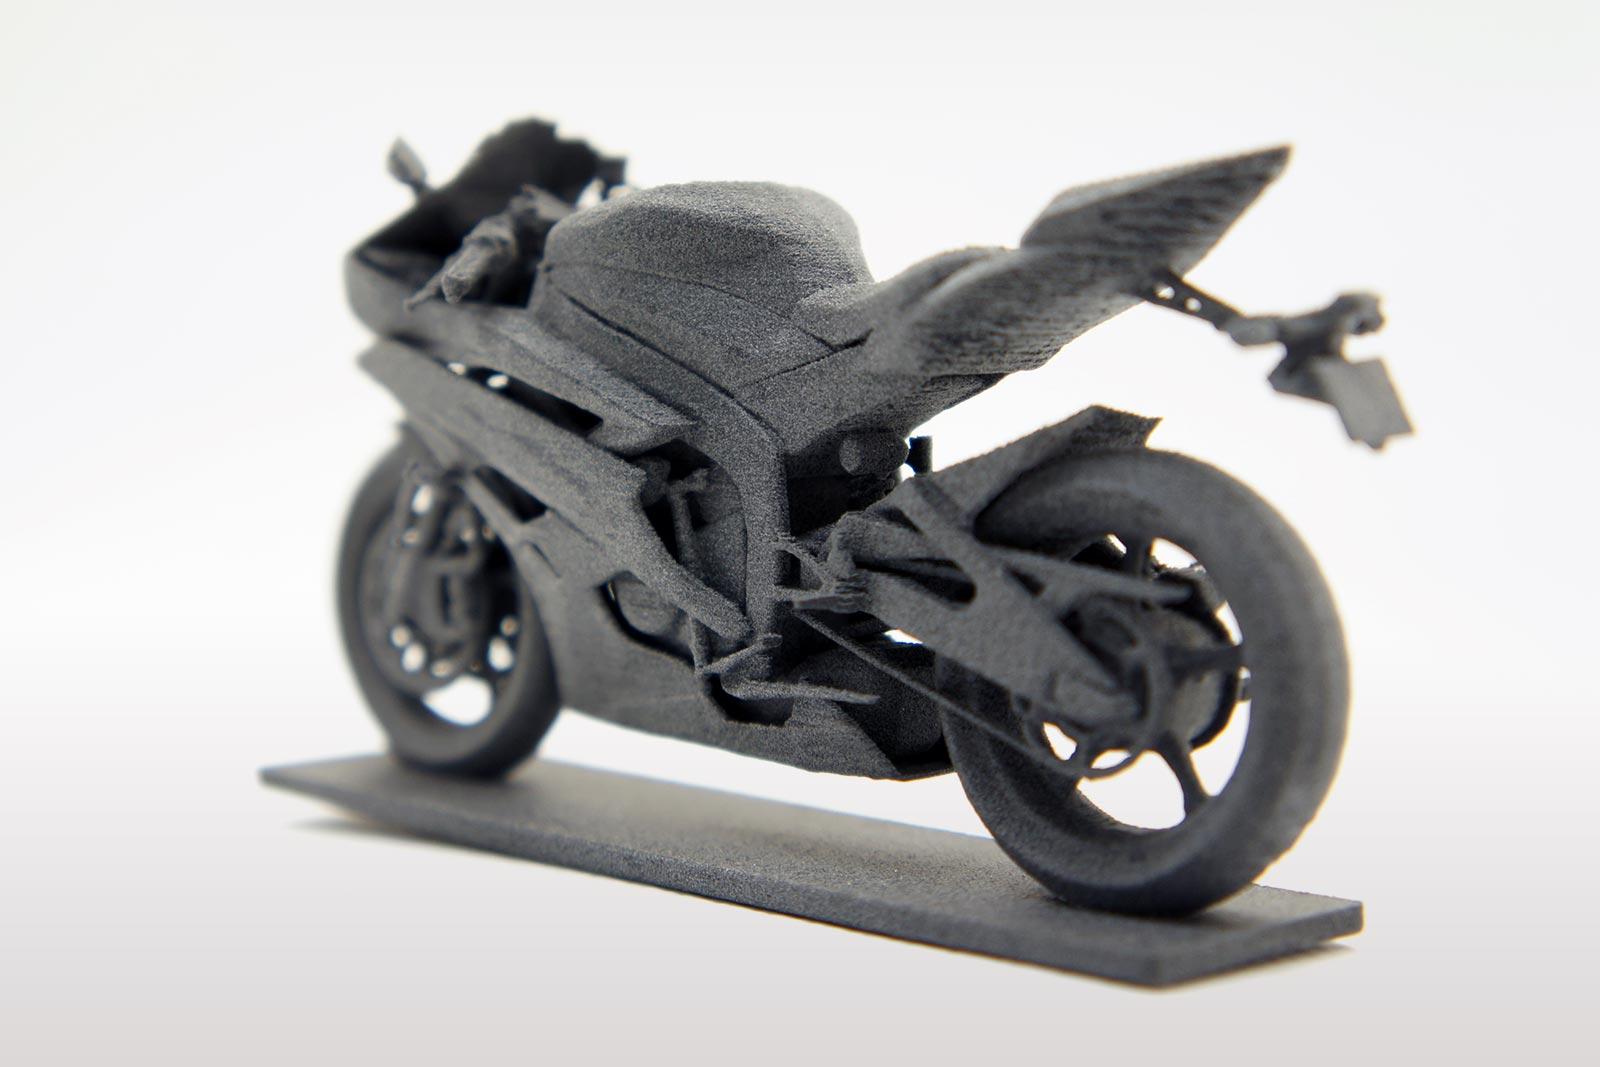 3D Printing - SLS